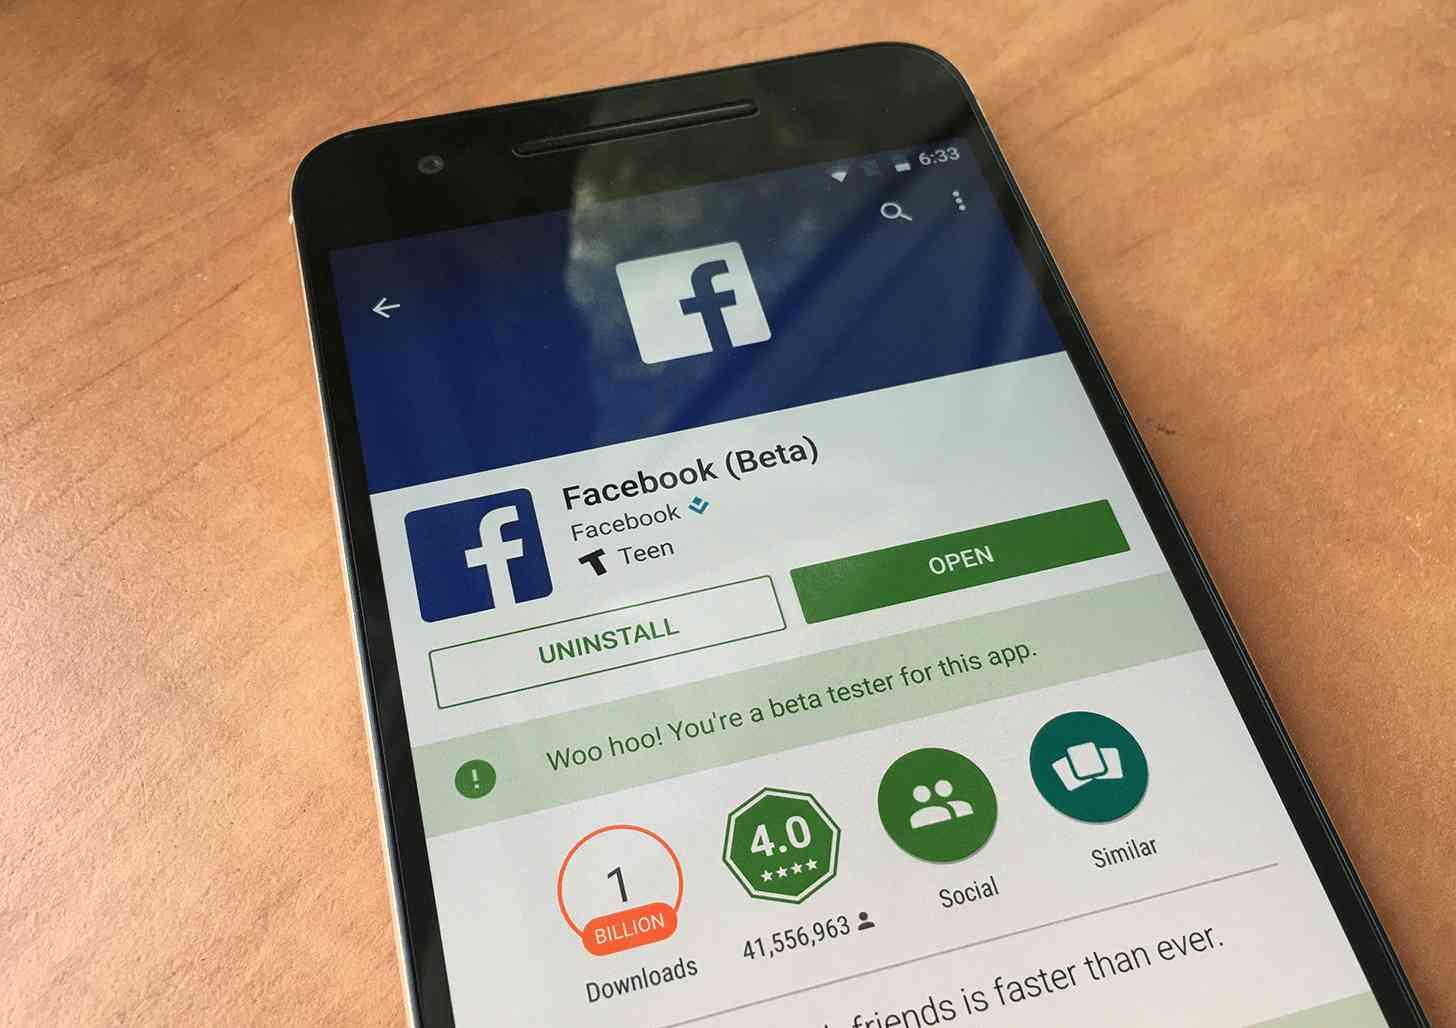 Facebook beta app Google Play Store update